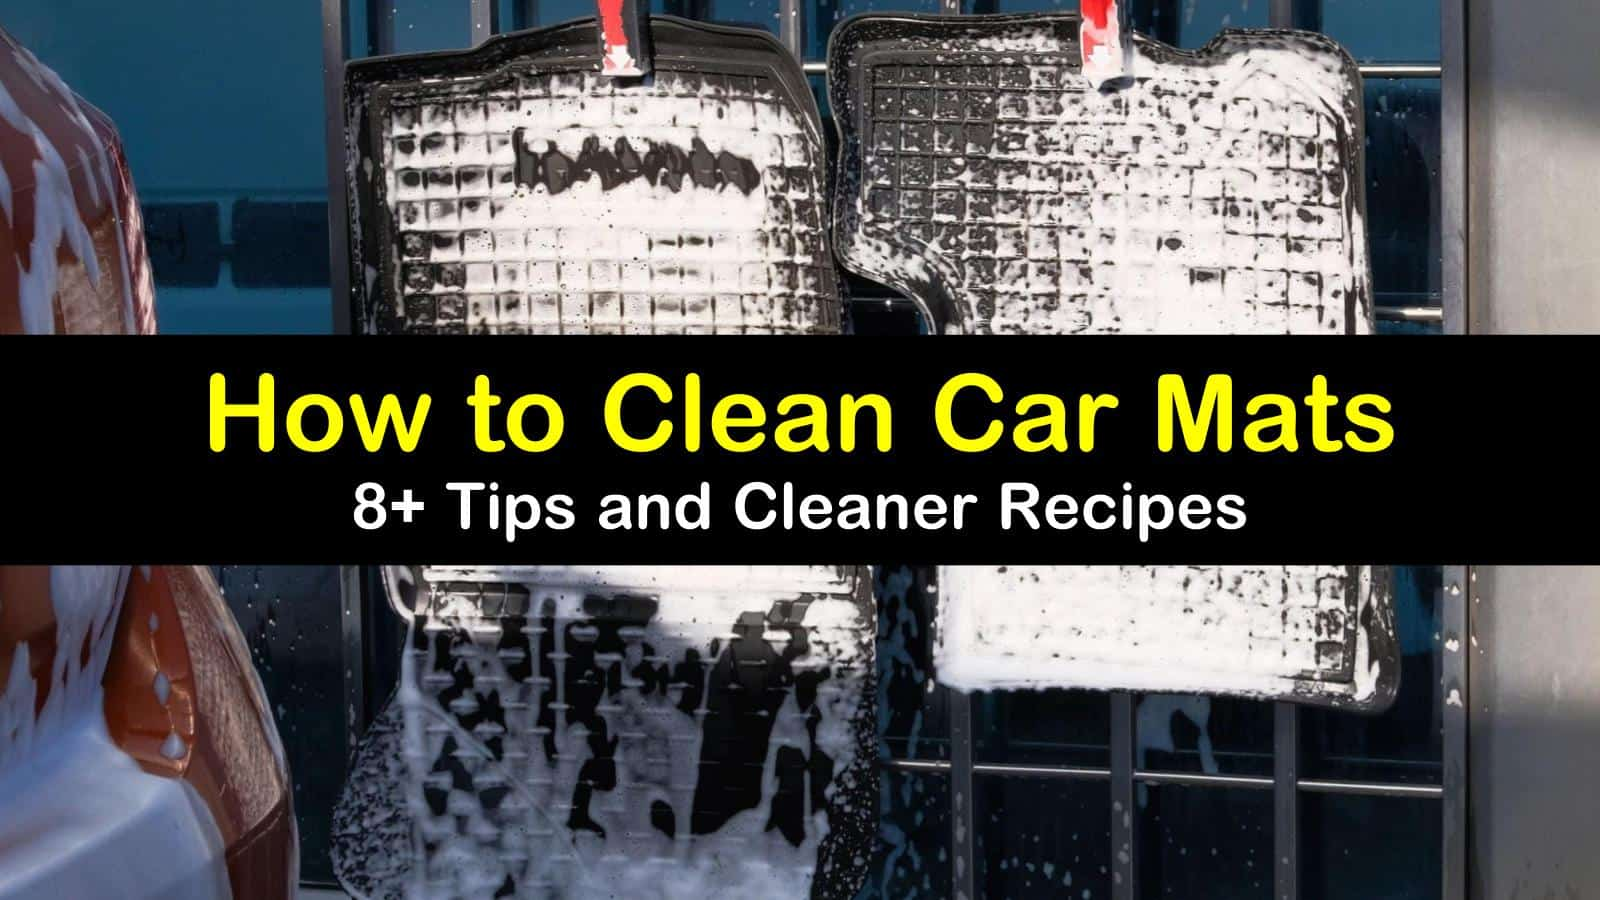 how to clean car mats titleimg1